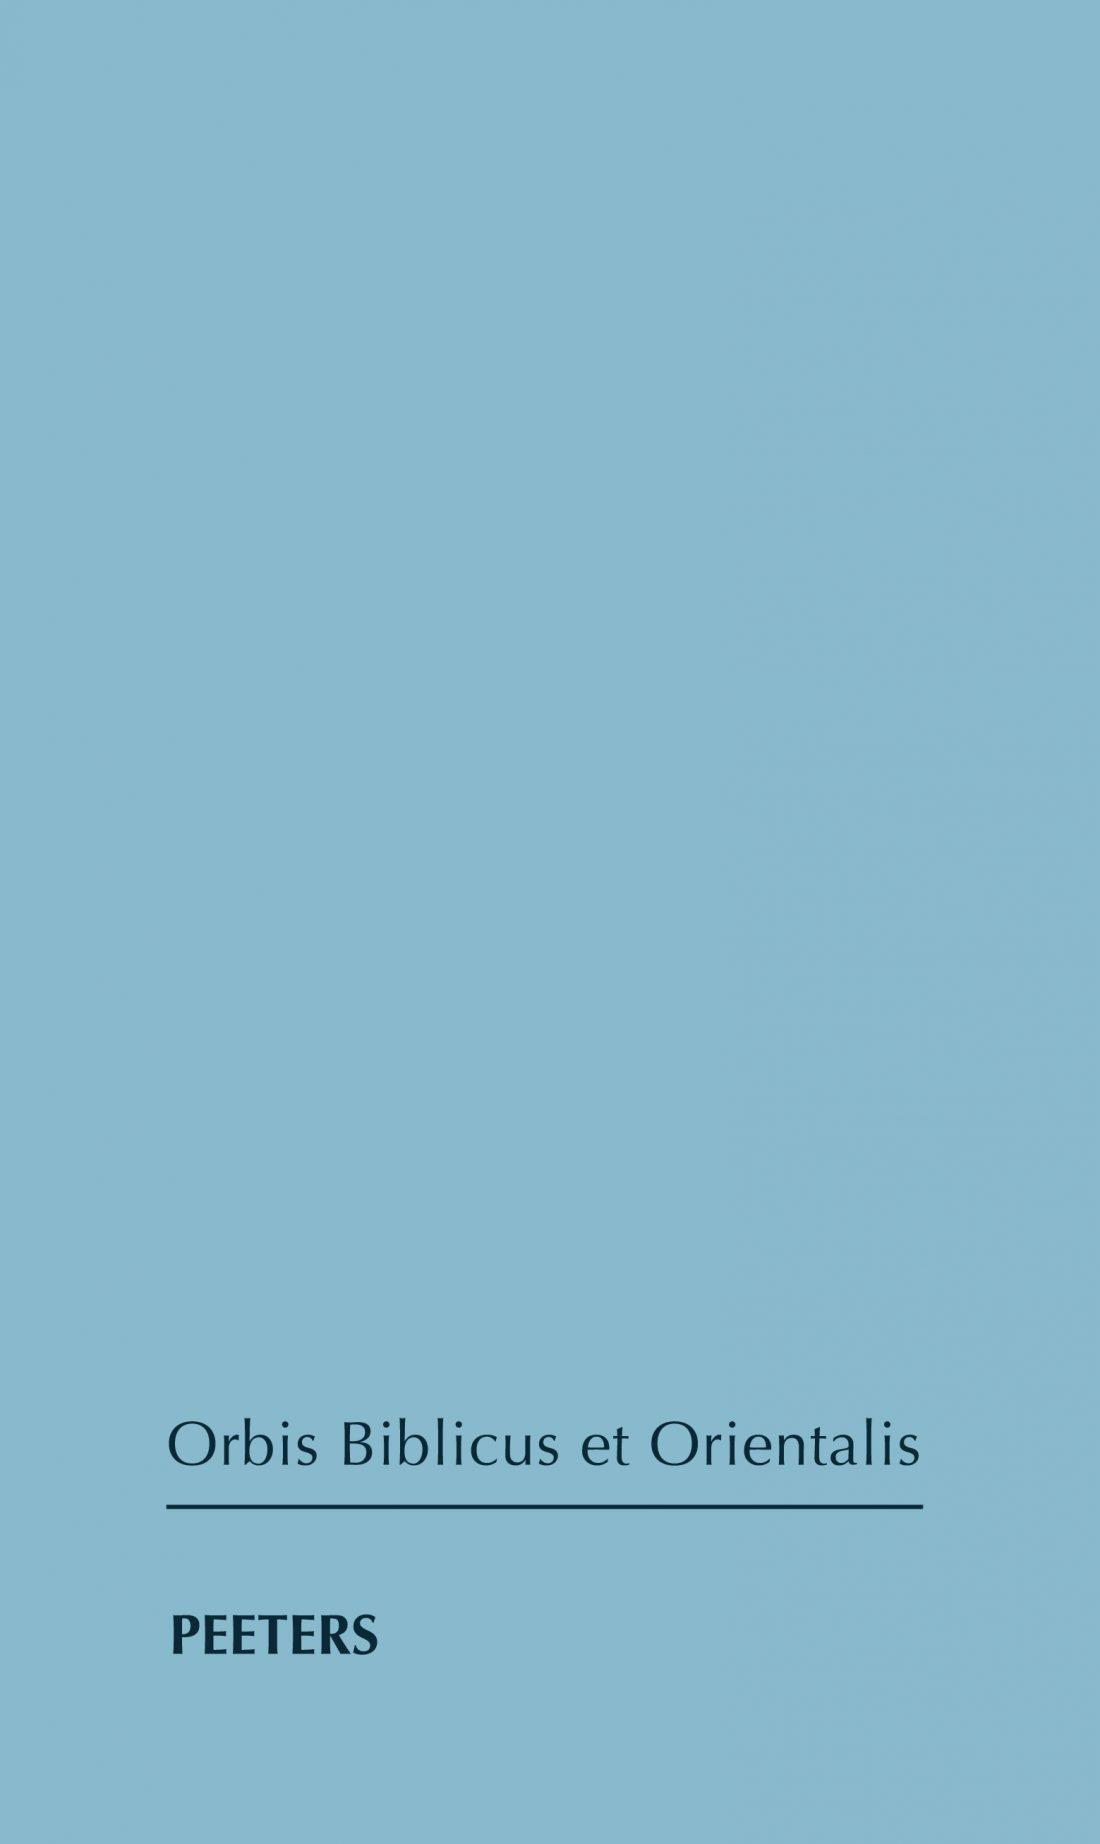 OBO_Peeters Publishers